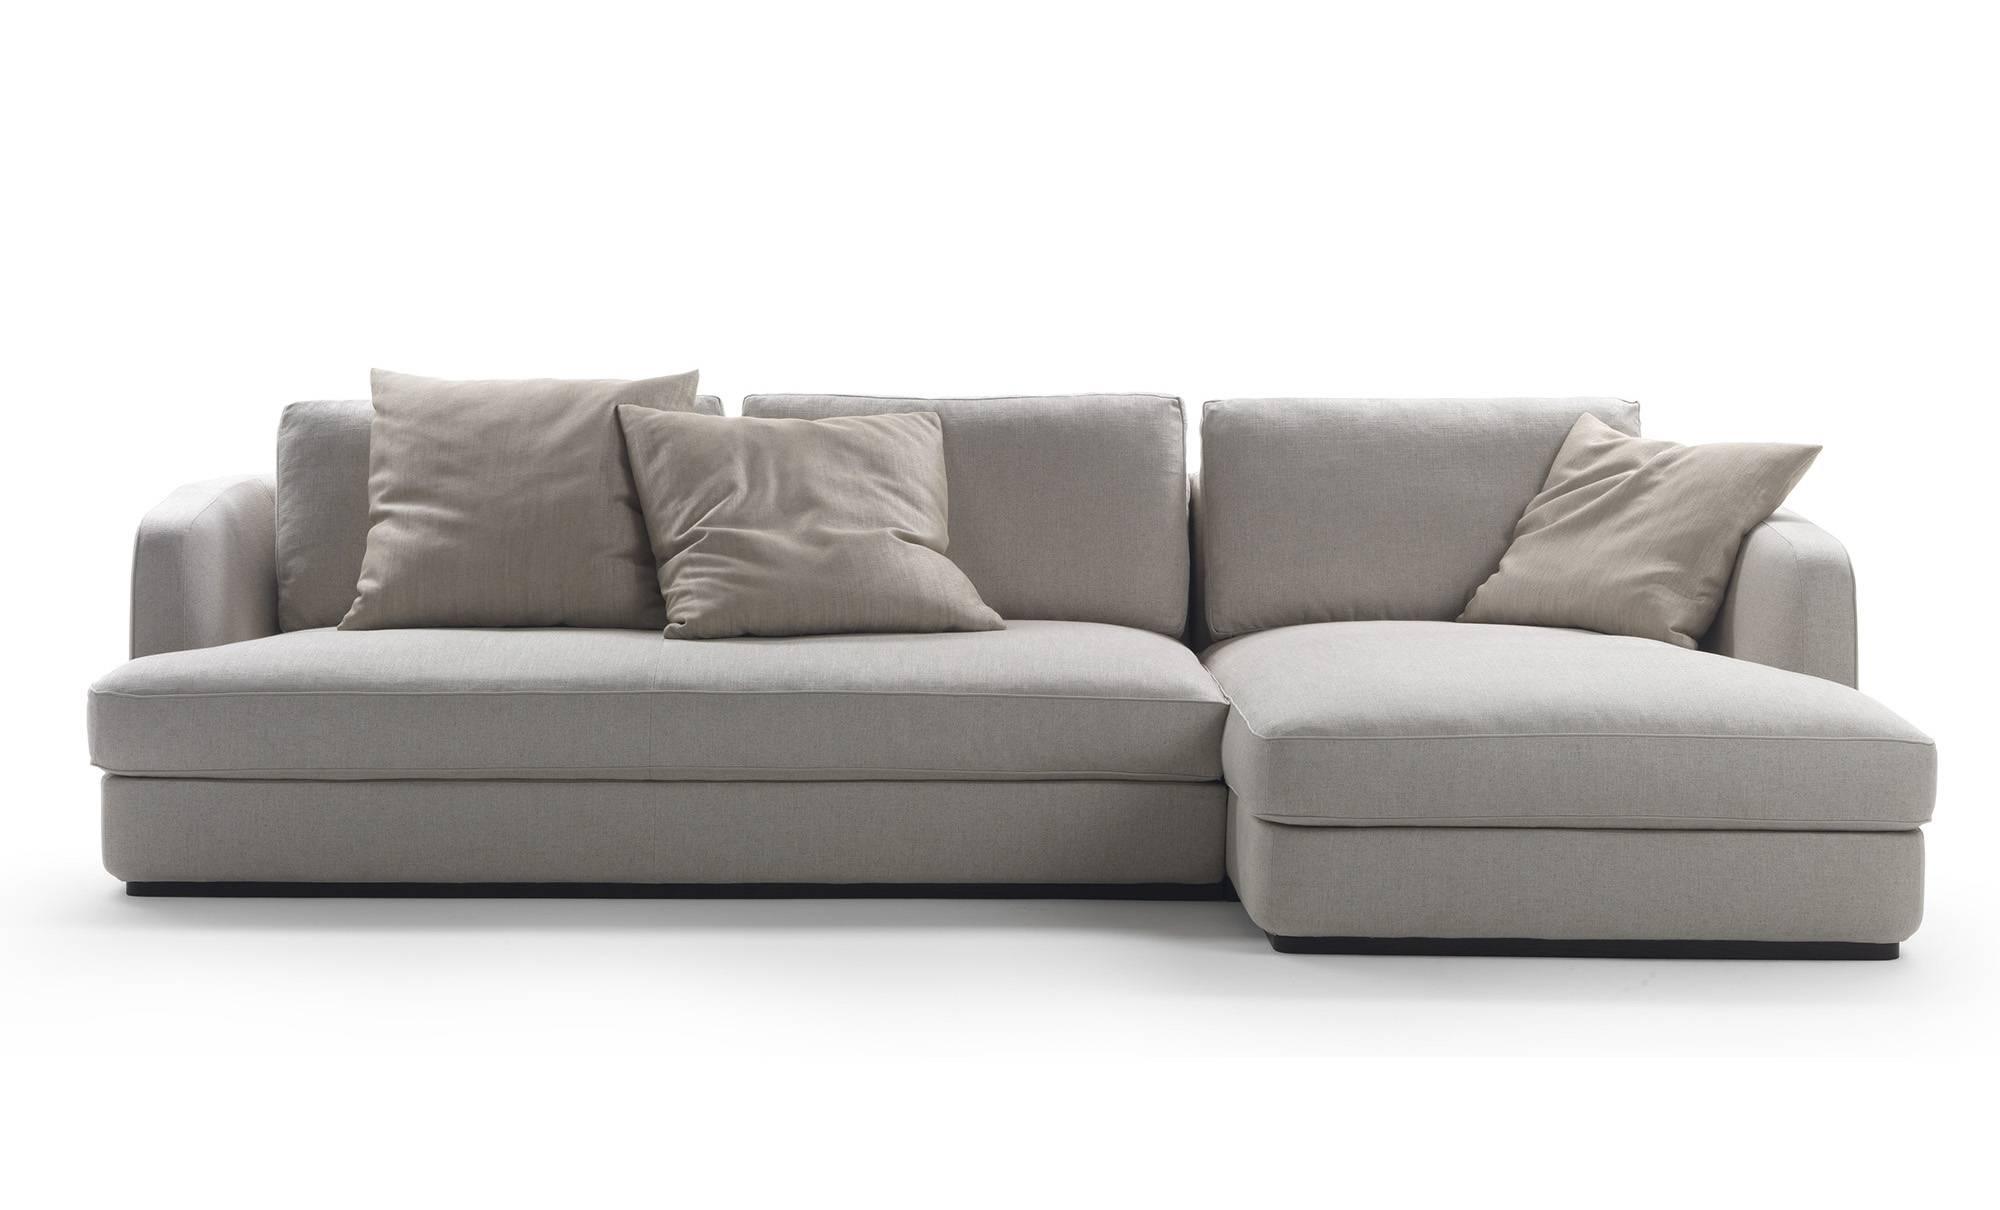 Barret Modular Sofa - Fanuli Furniture within Modular Sofas (Image 1 of 15)